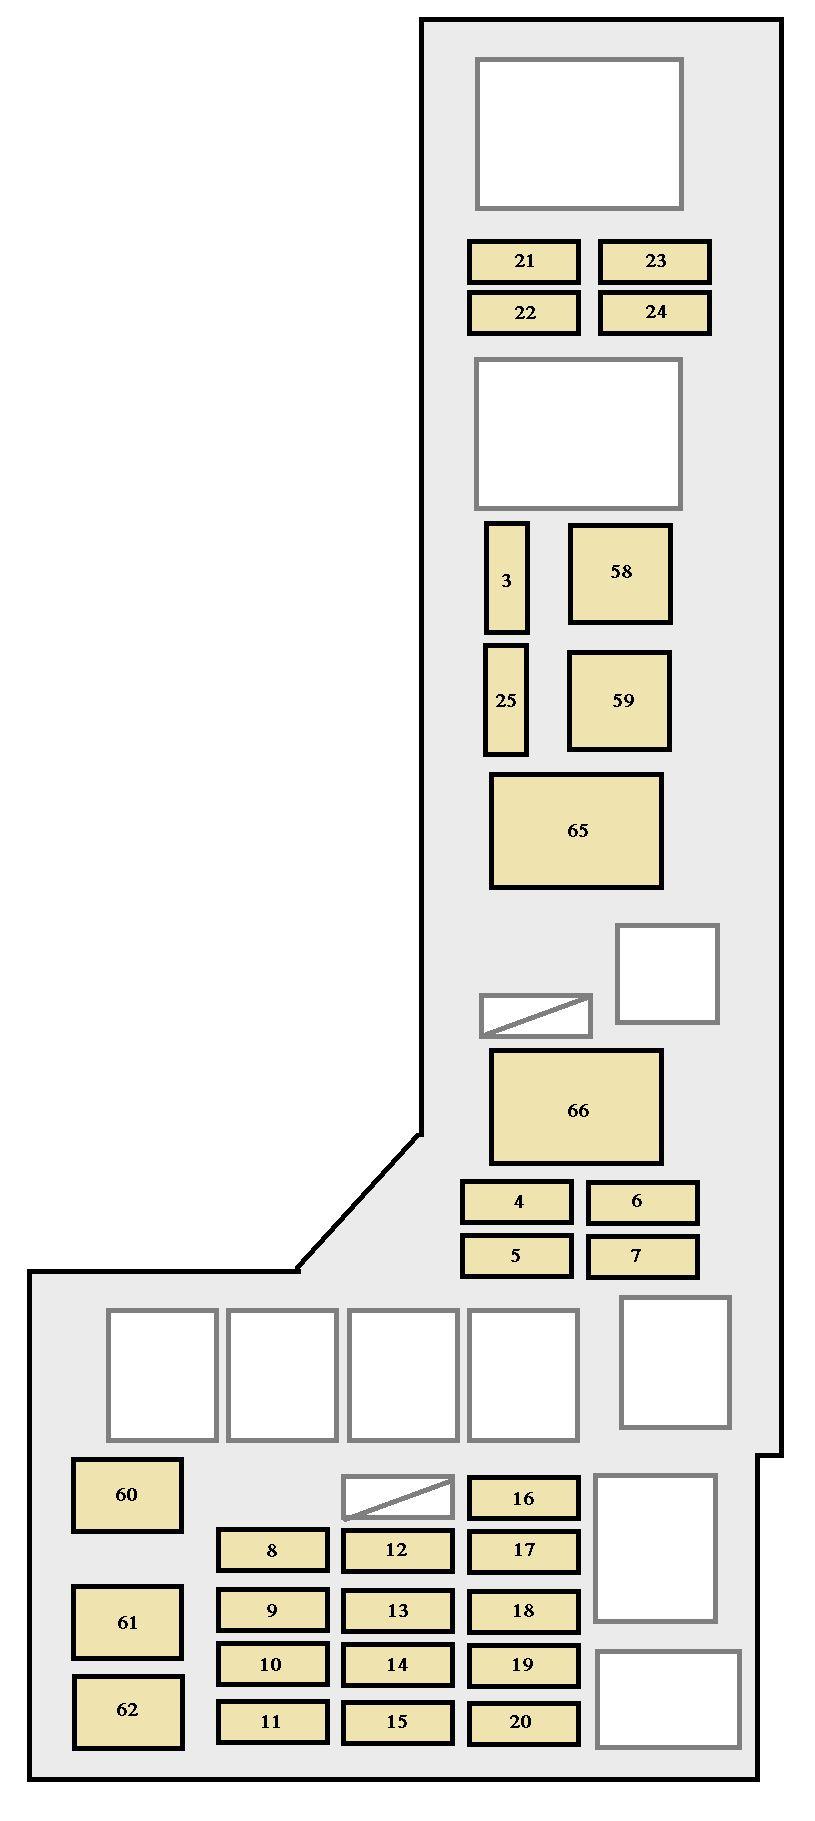 hight resolution of toyota avalon 2000 2002 fuse box diagram